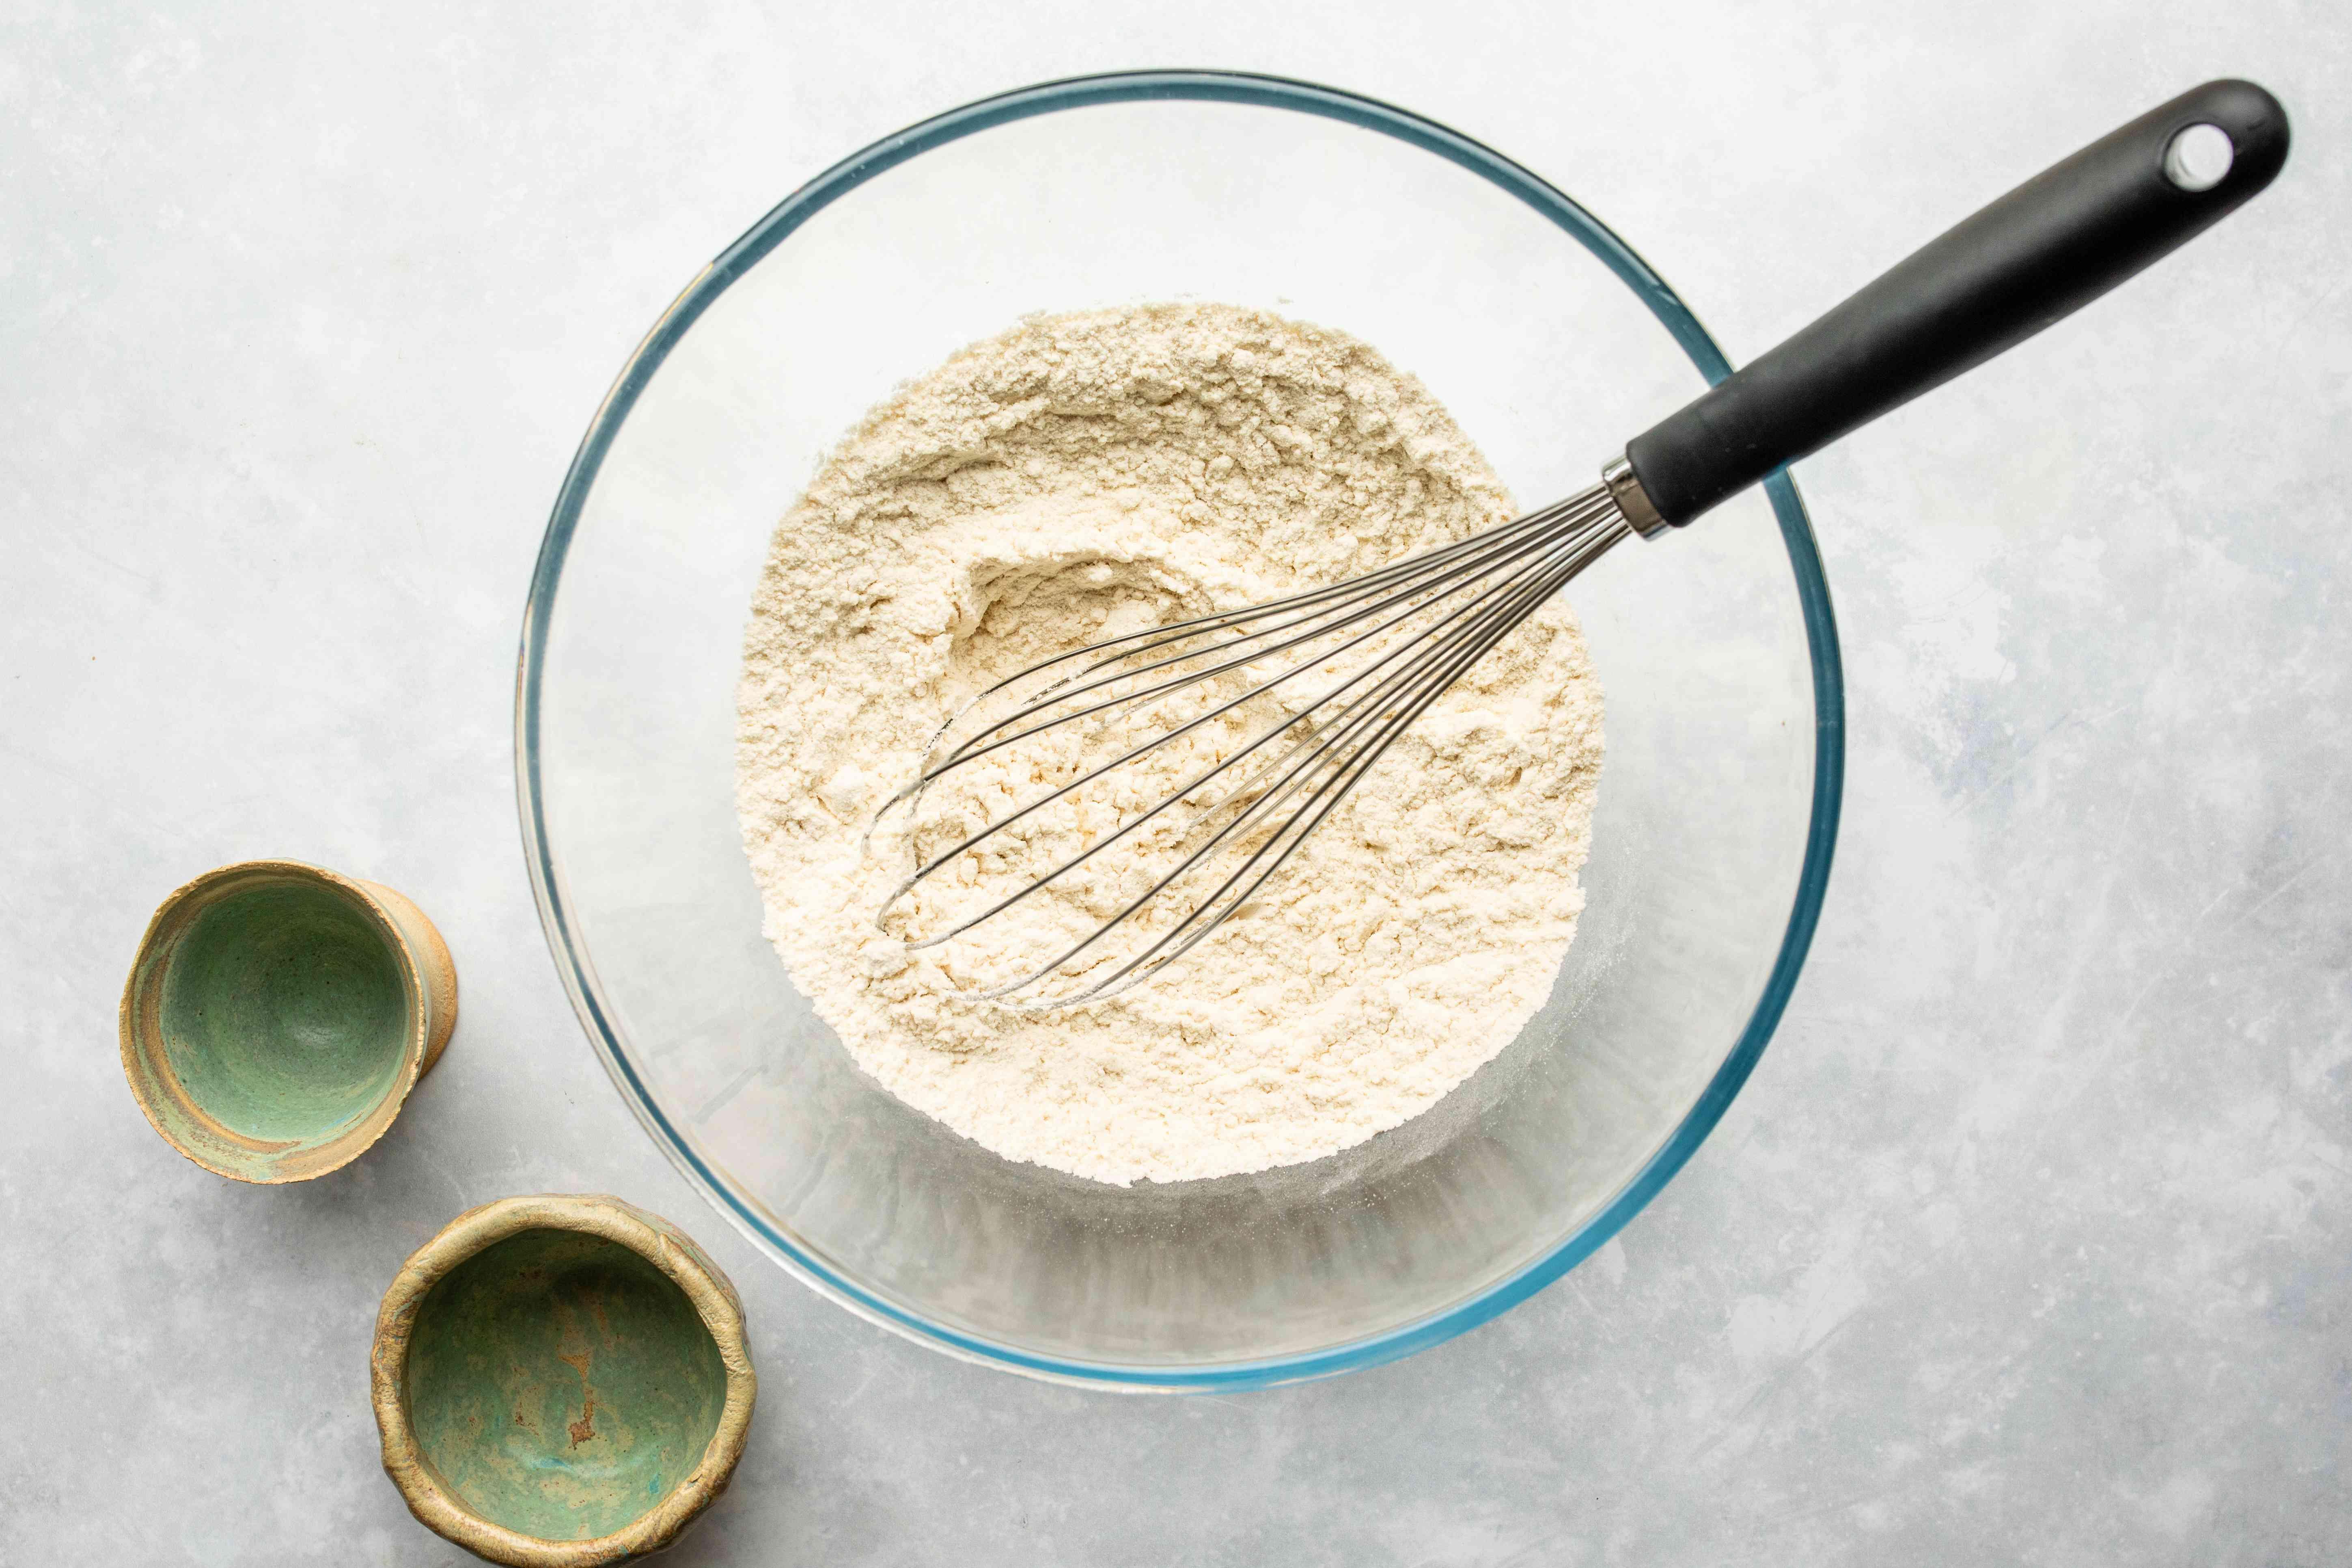 Combine flour and salt